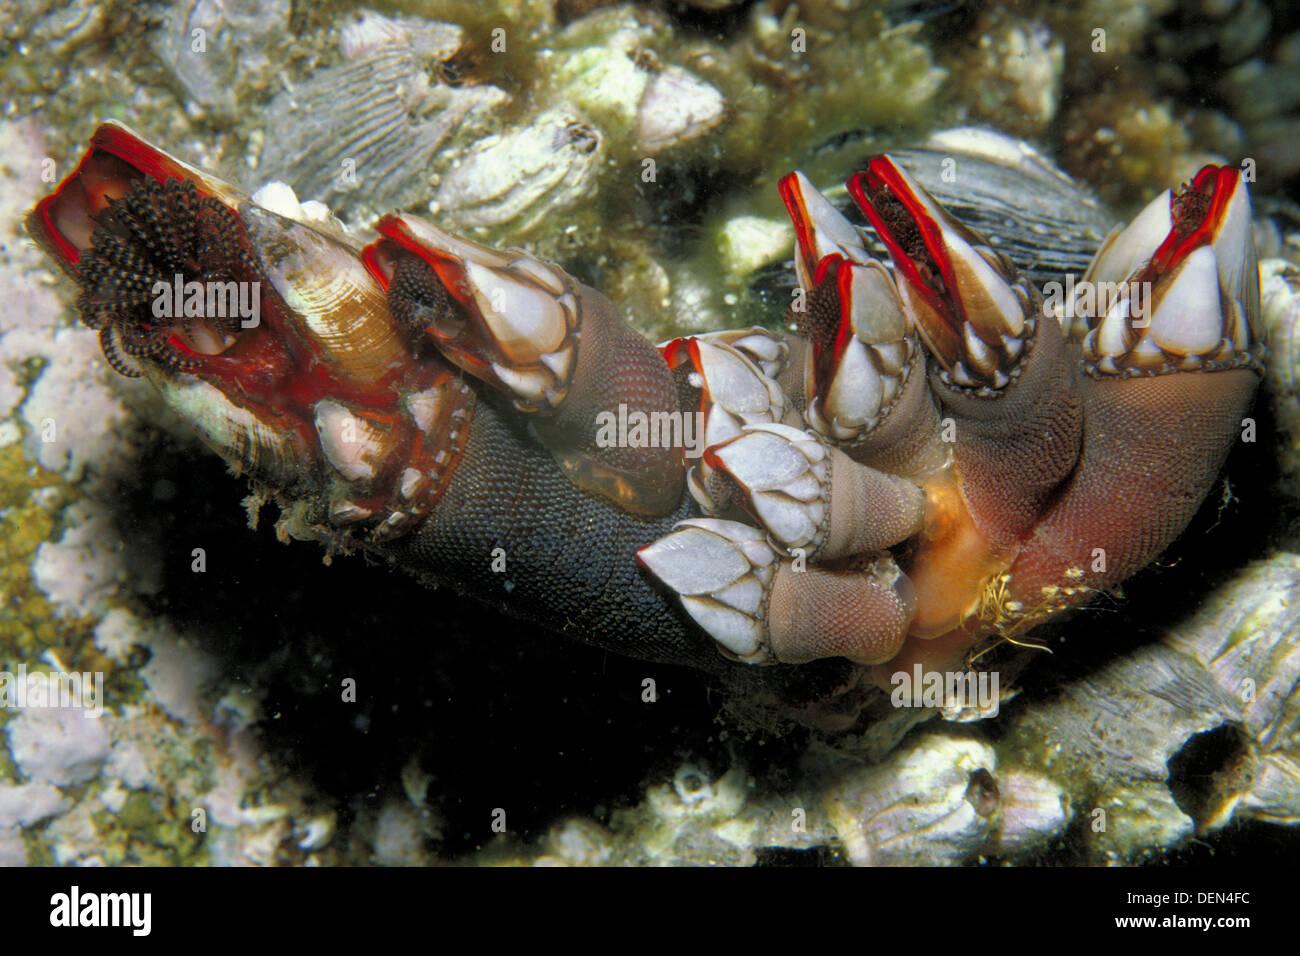 Barnacle (Pollicipes cornucopia) - Stock Image